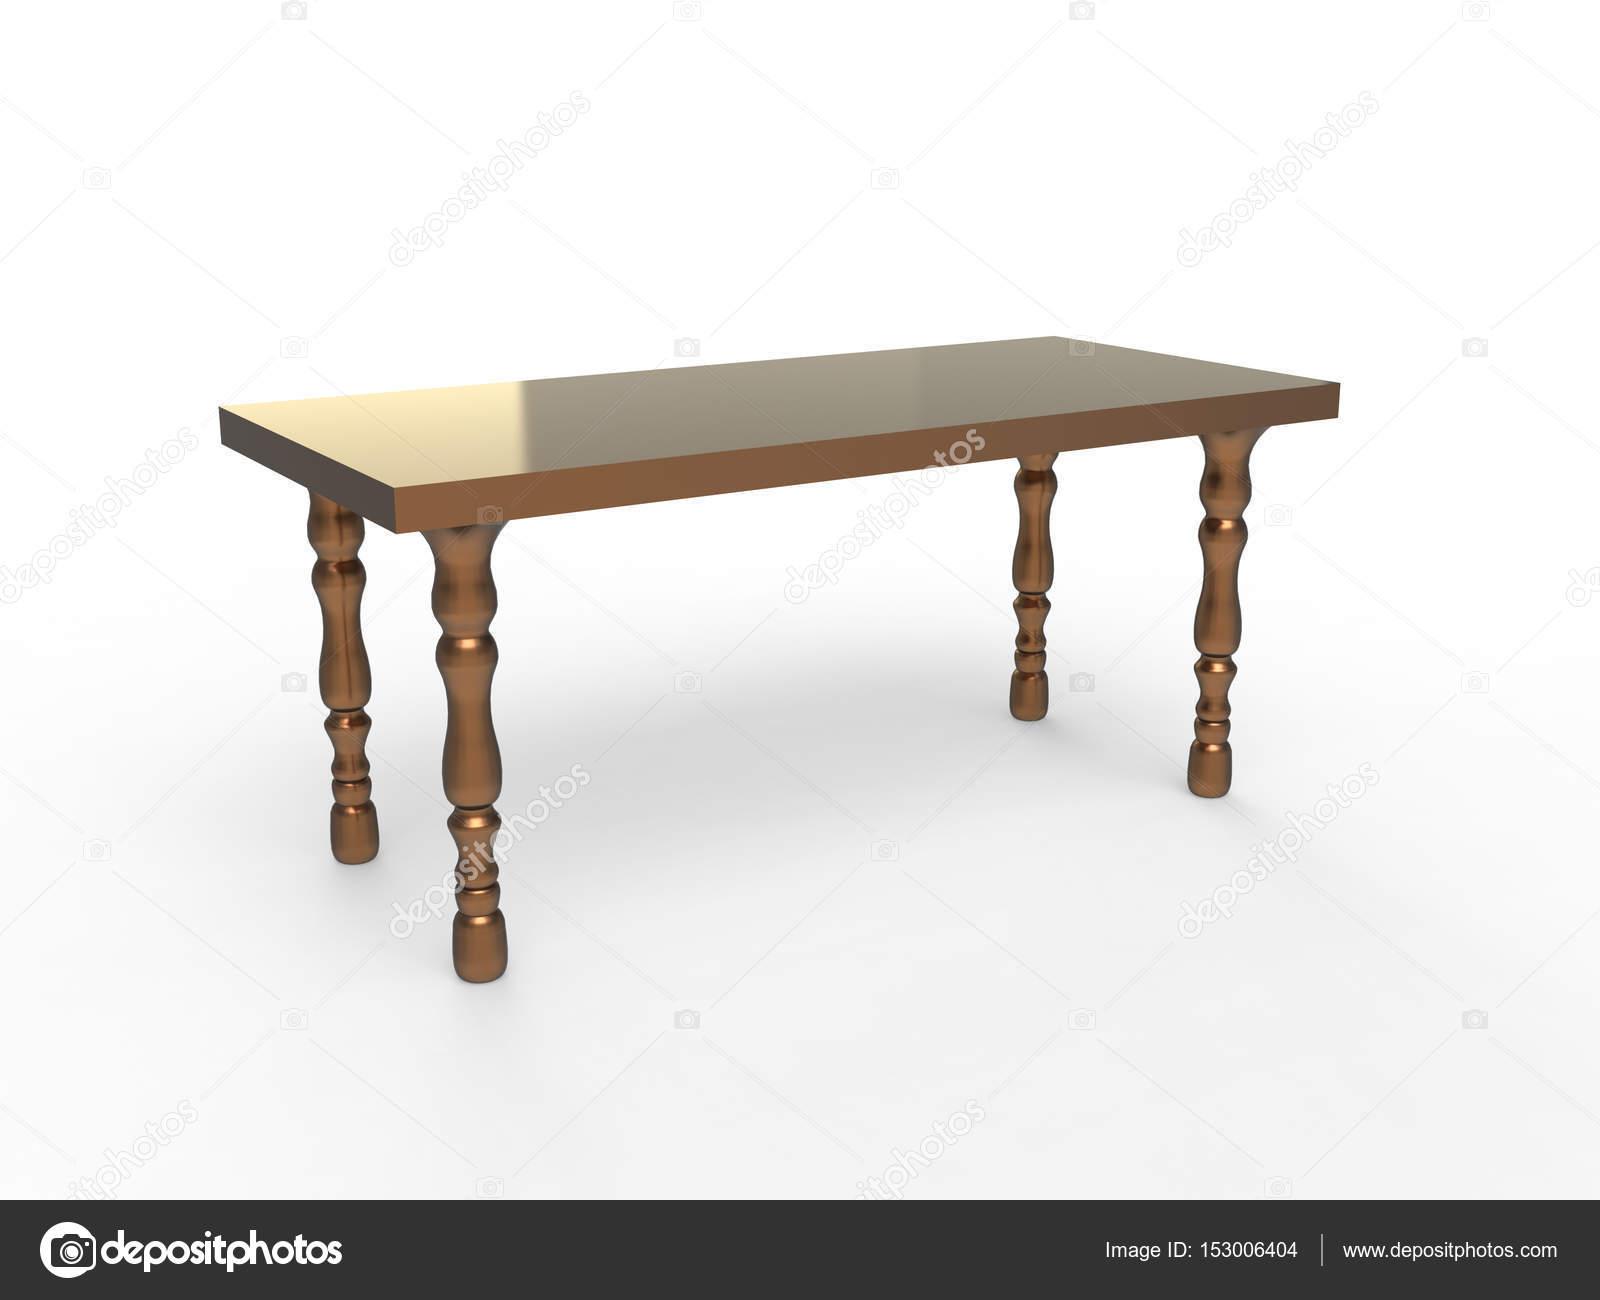 Scrivania Moderna Design : Idee per una scrivania a misura di bambino mammeacrobate